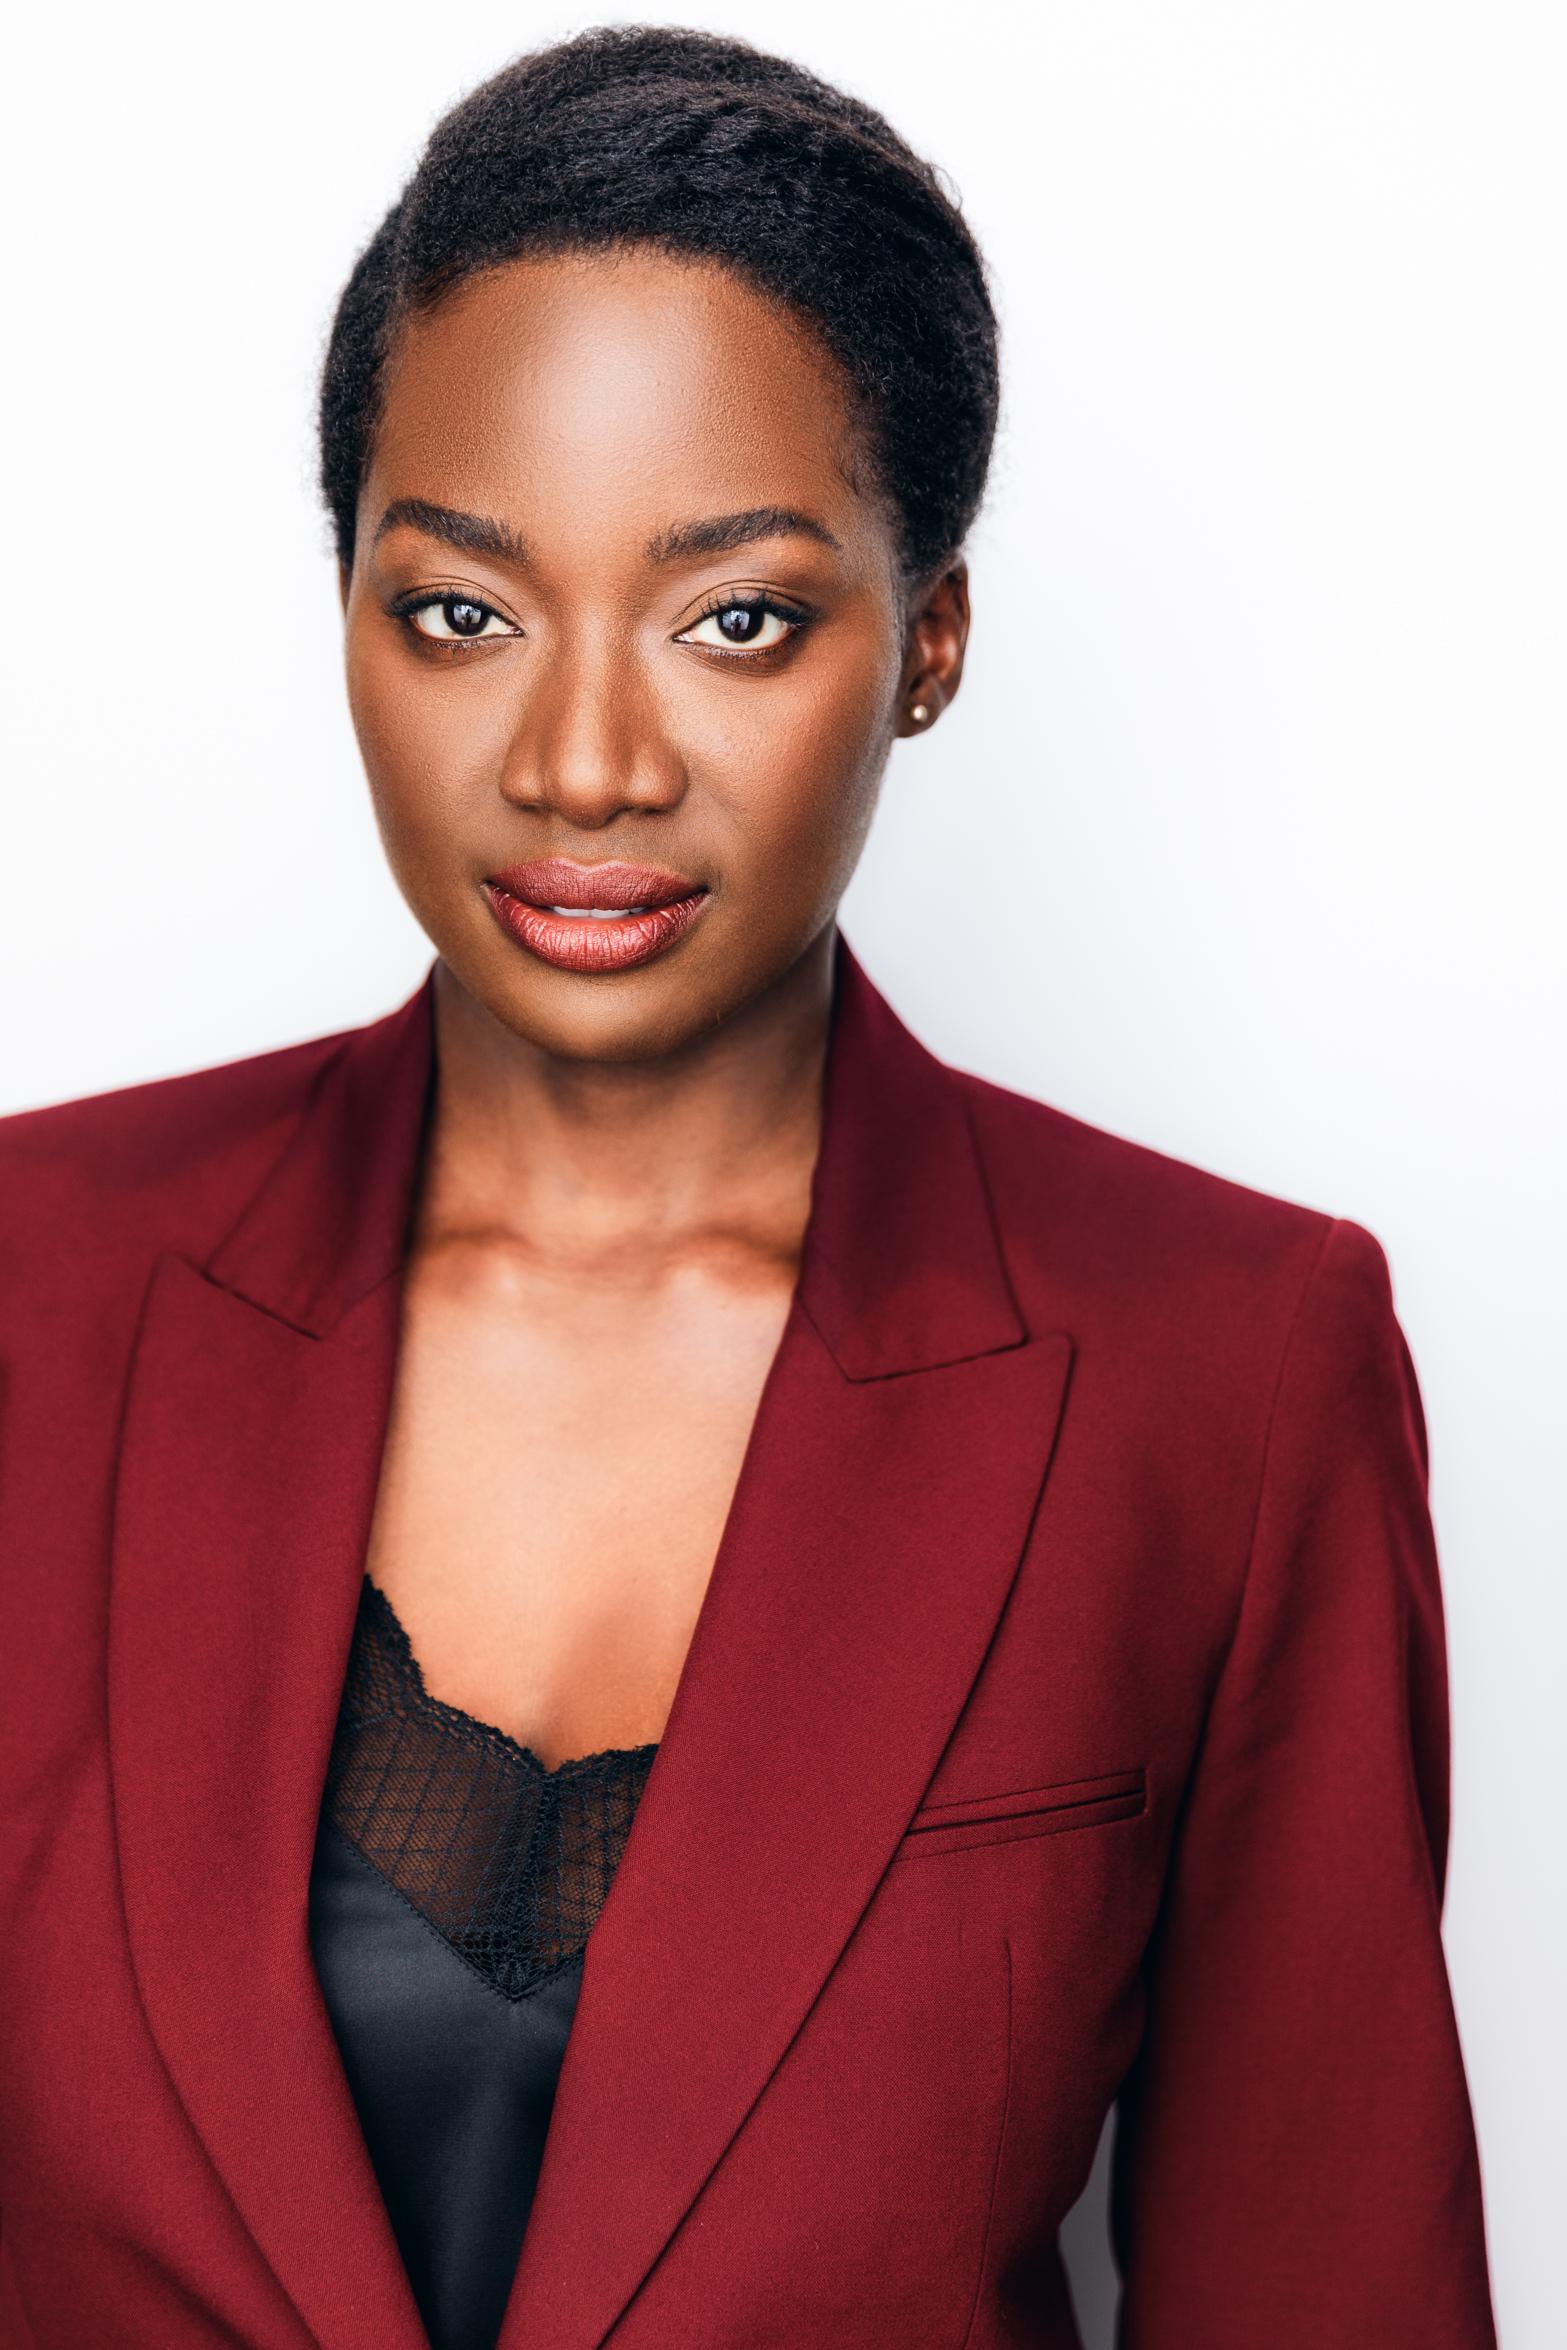 Anne-Marie Agbodji